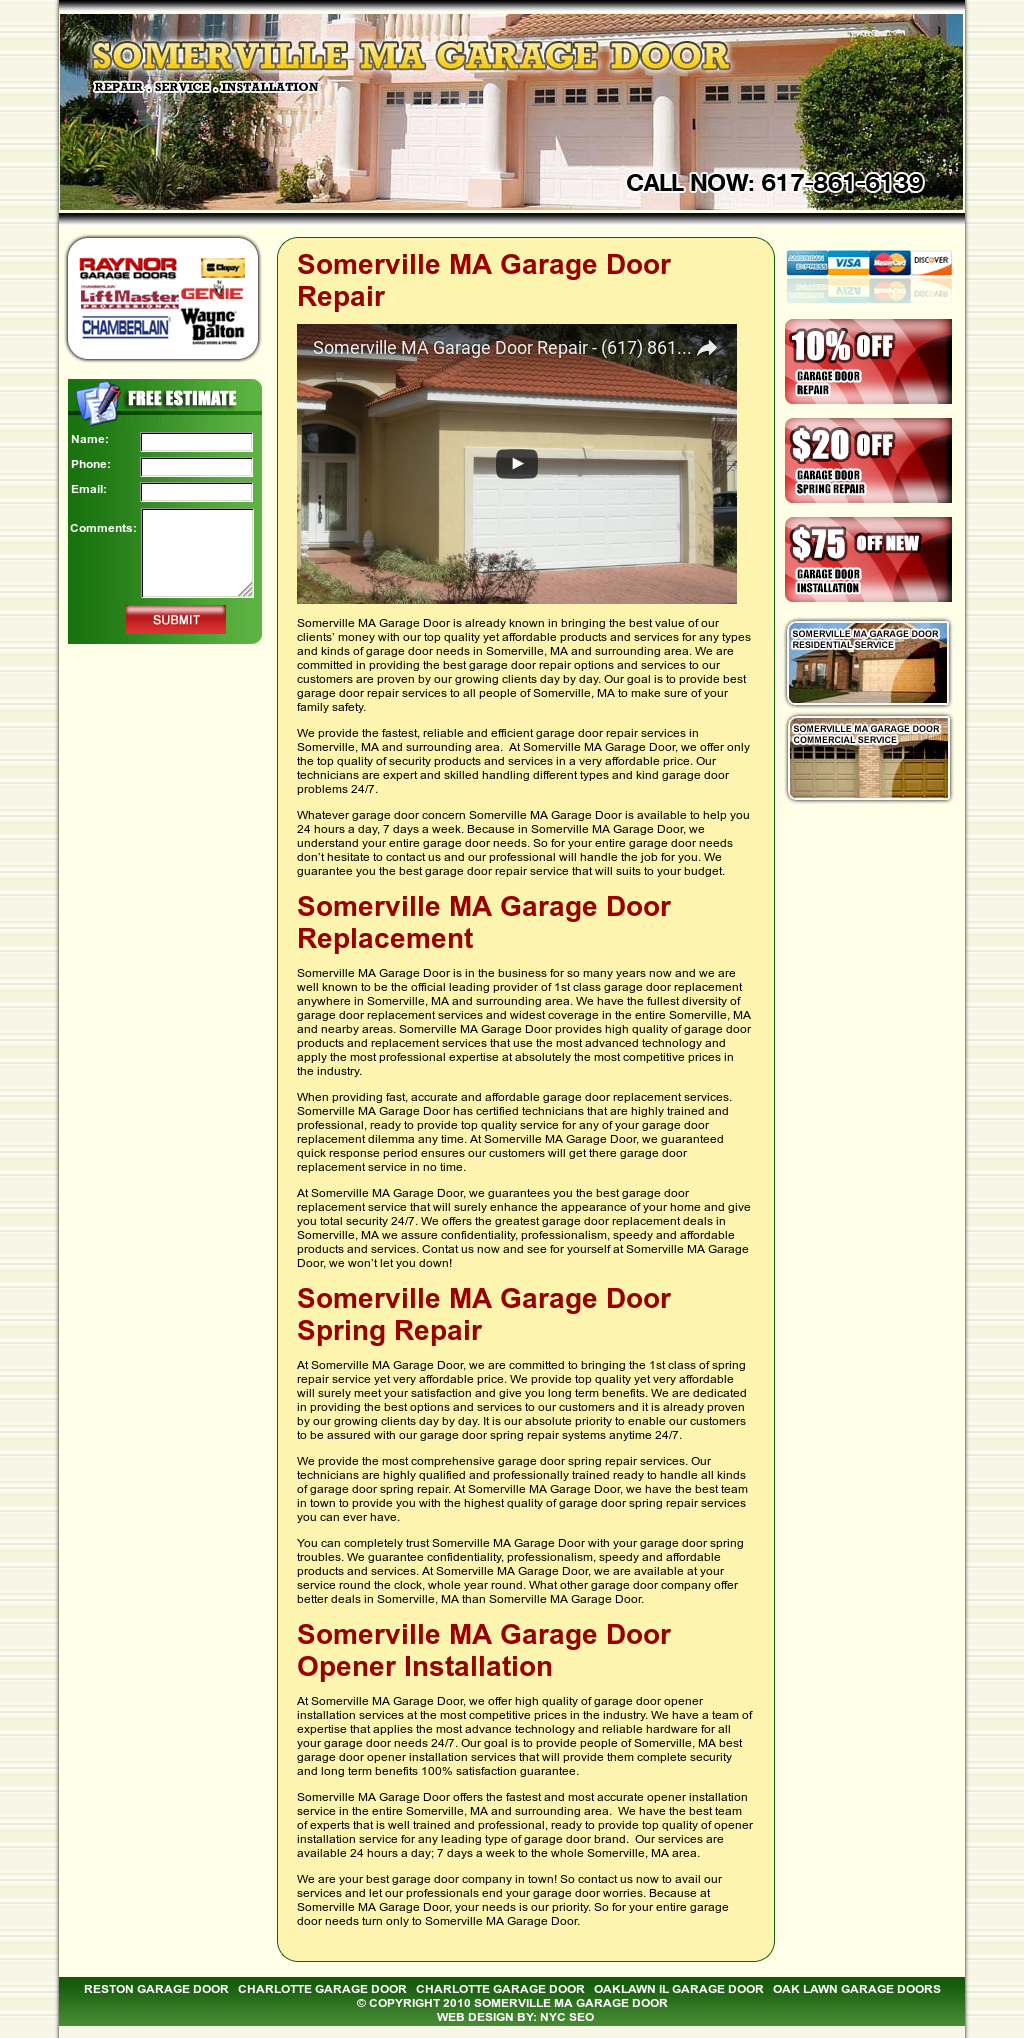 Somerville Ma Garage Door Competitors Revenue And Employees Owler